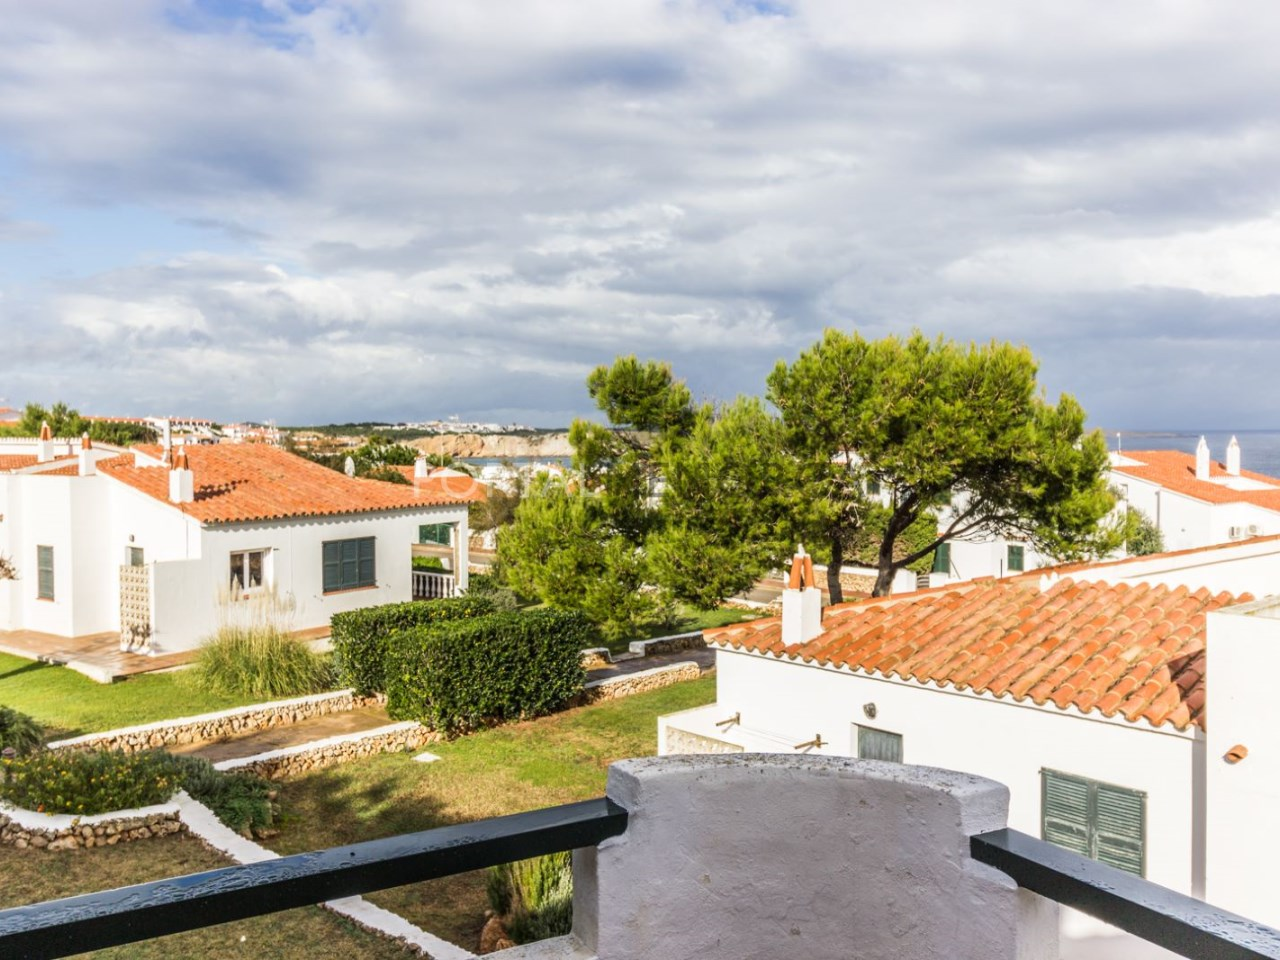 apartamento en venta en Arenal d'en Castell (2 de 14)